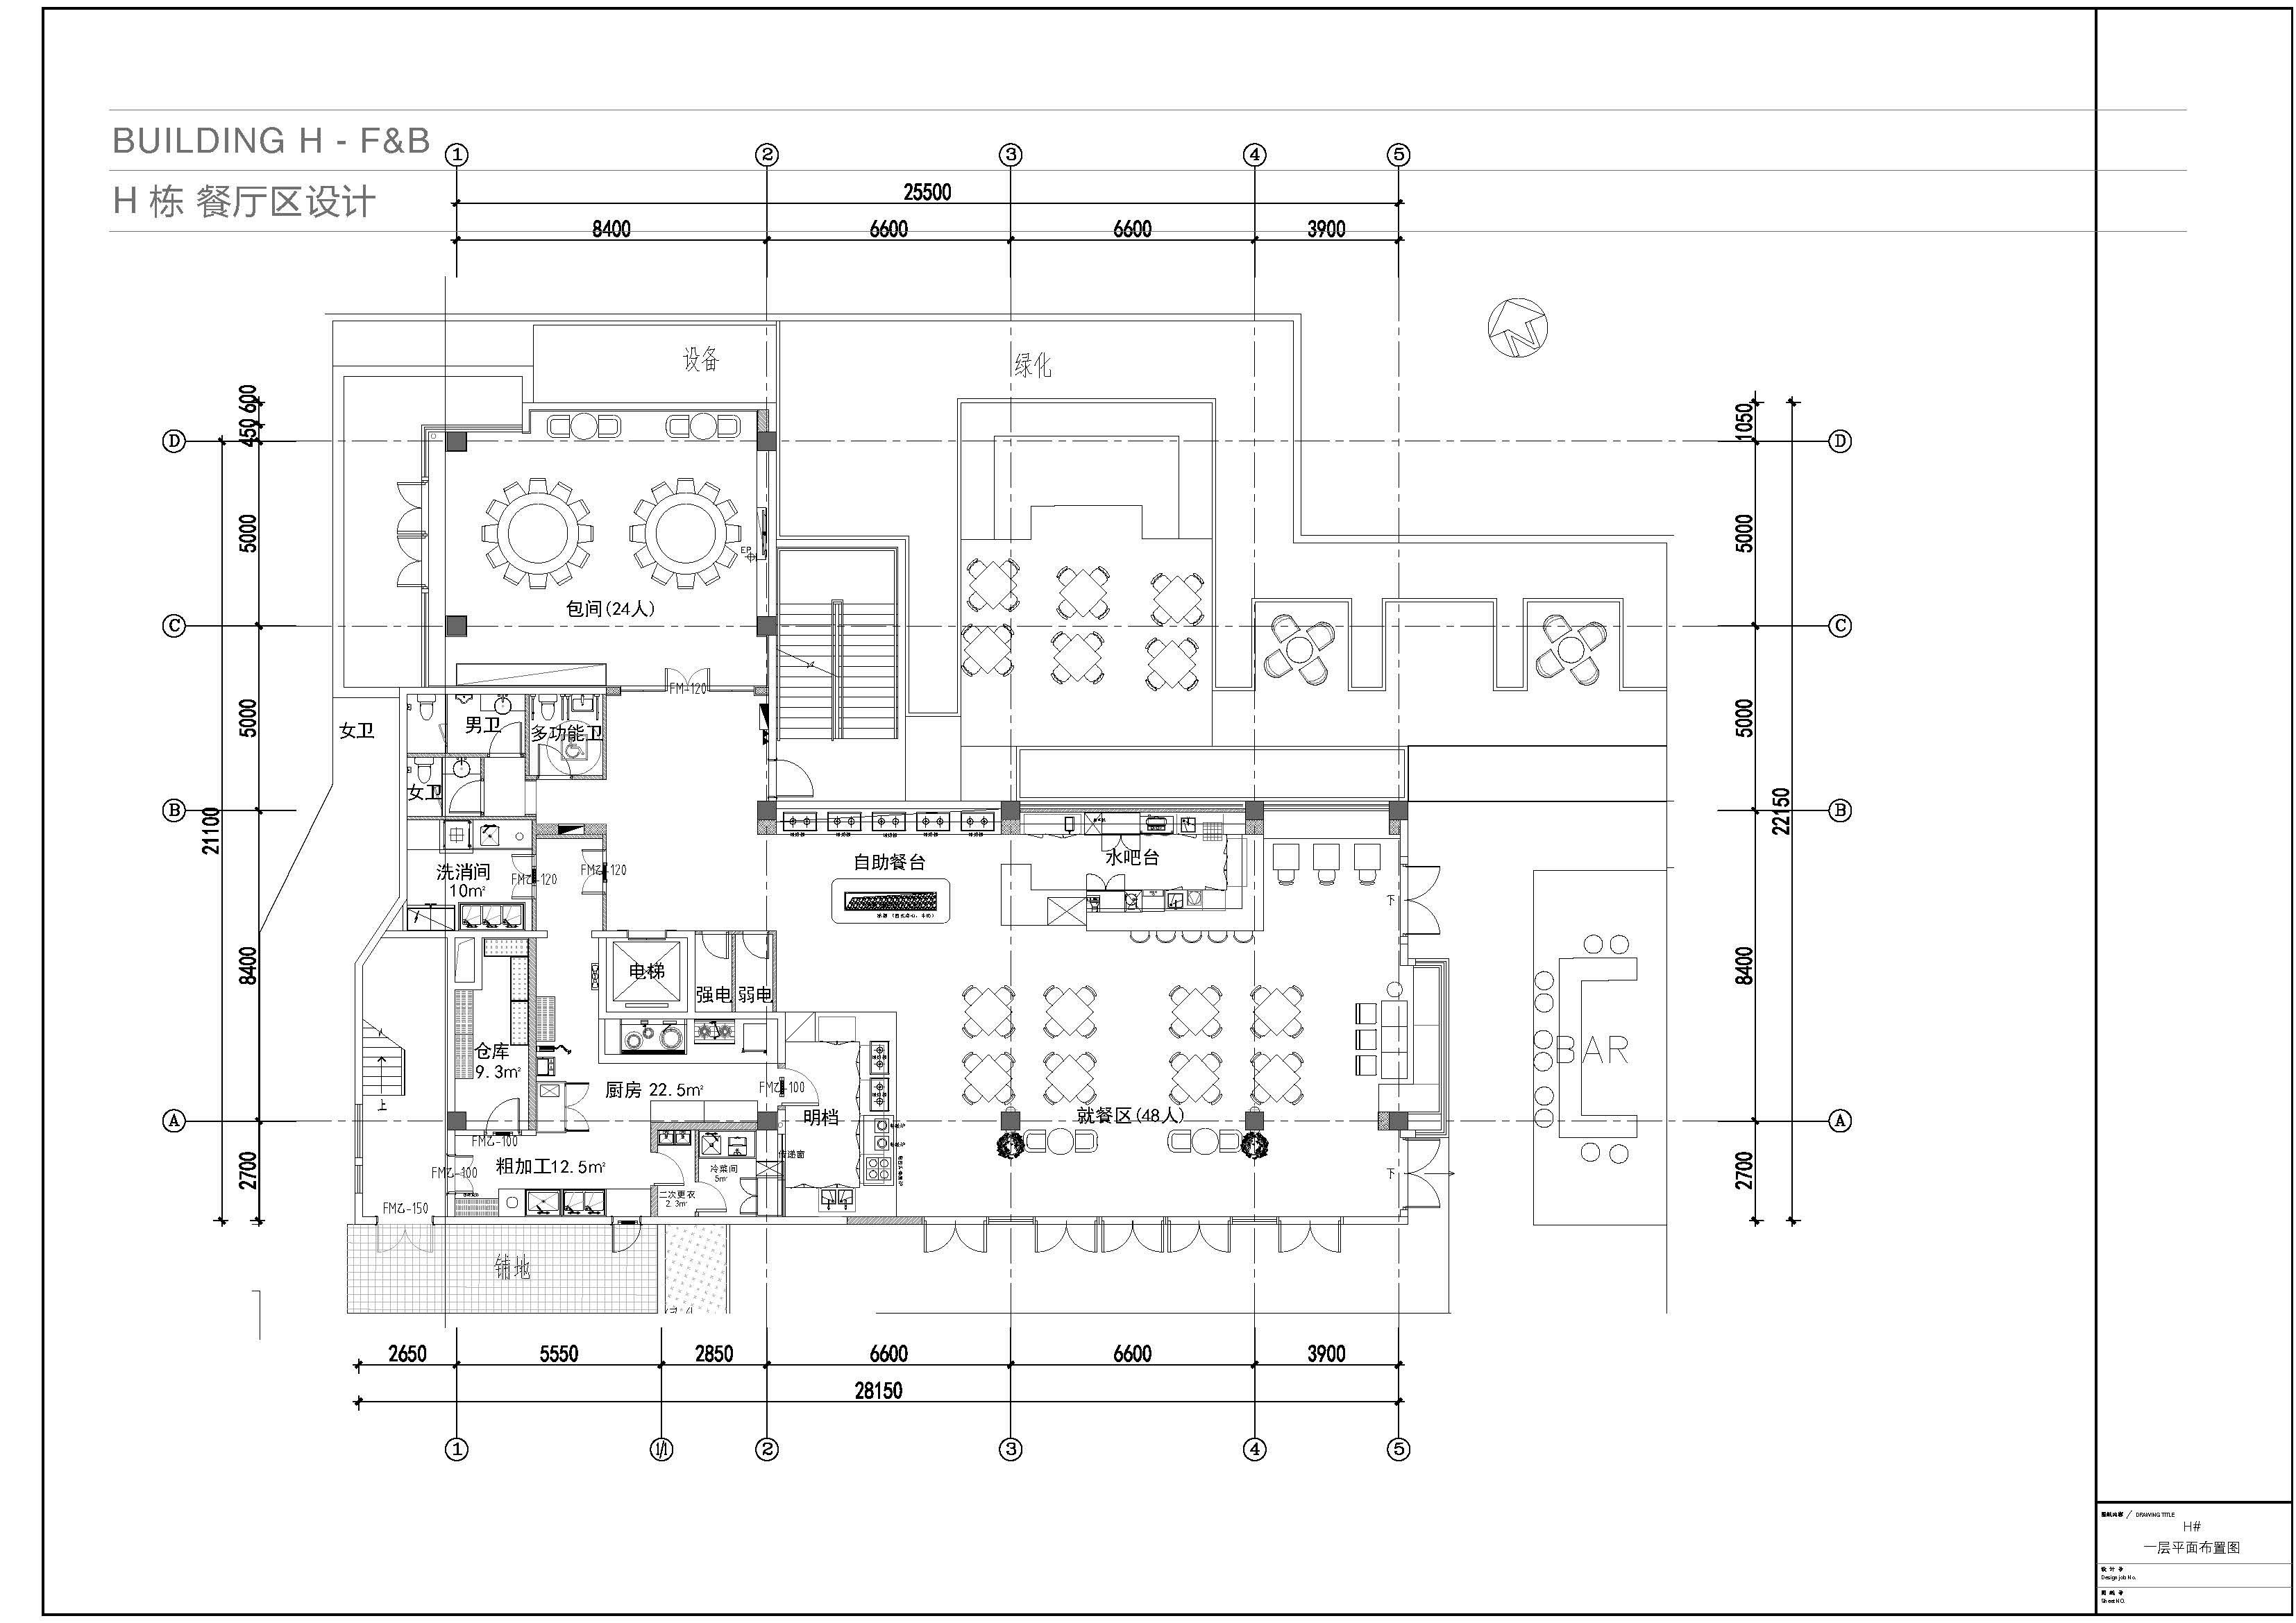 Building 1 layout Wei Sun}